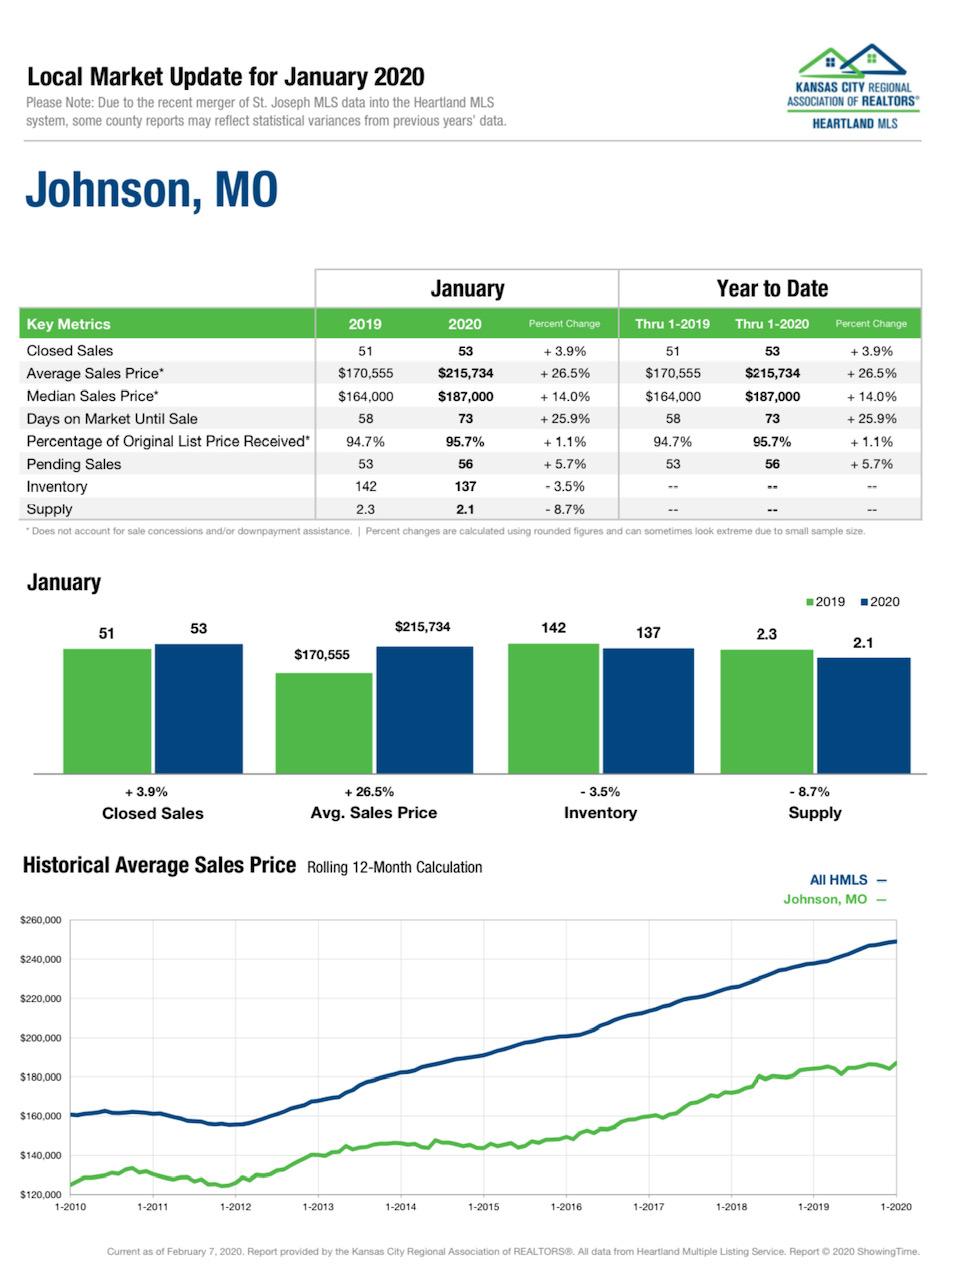 January 2020 Johnson County Market Update